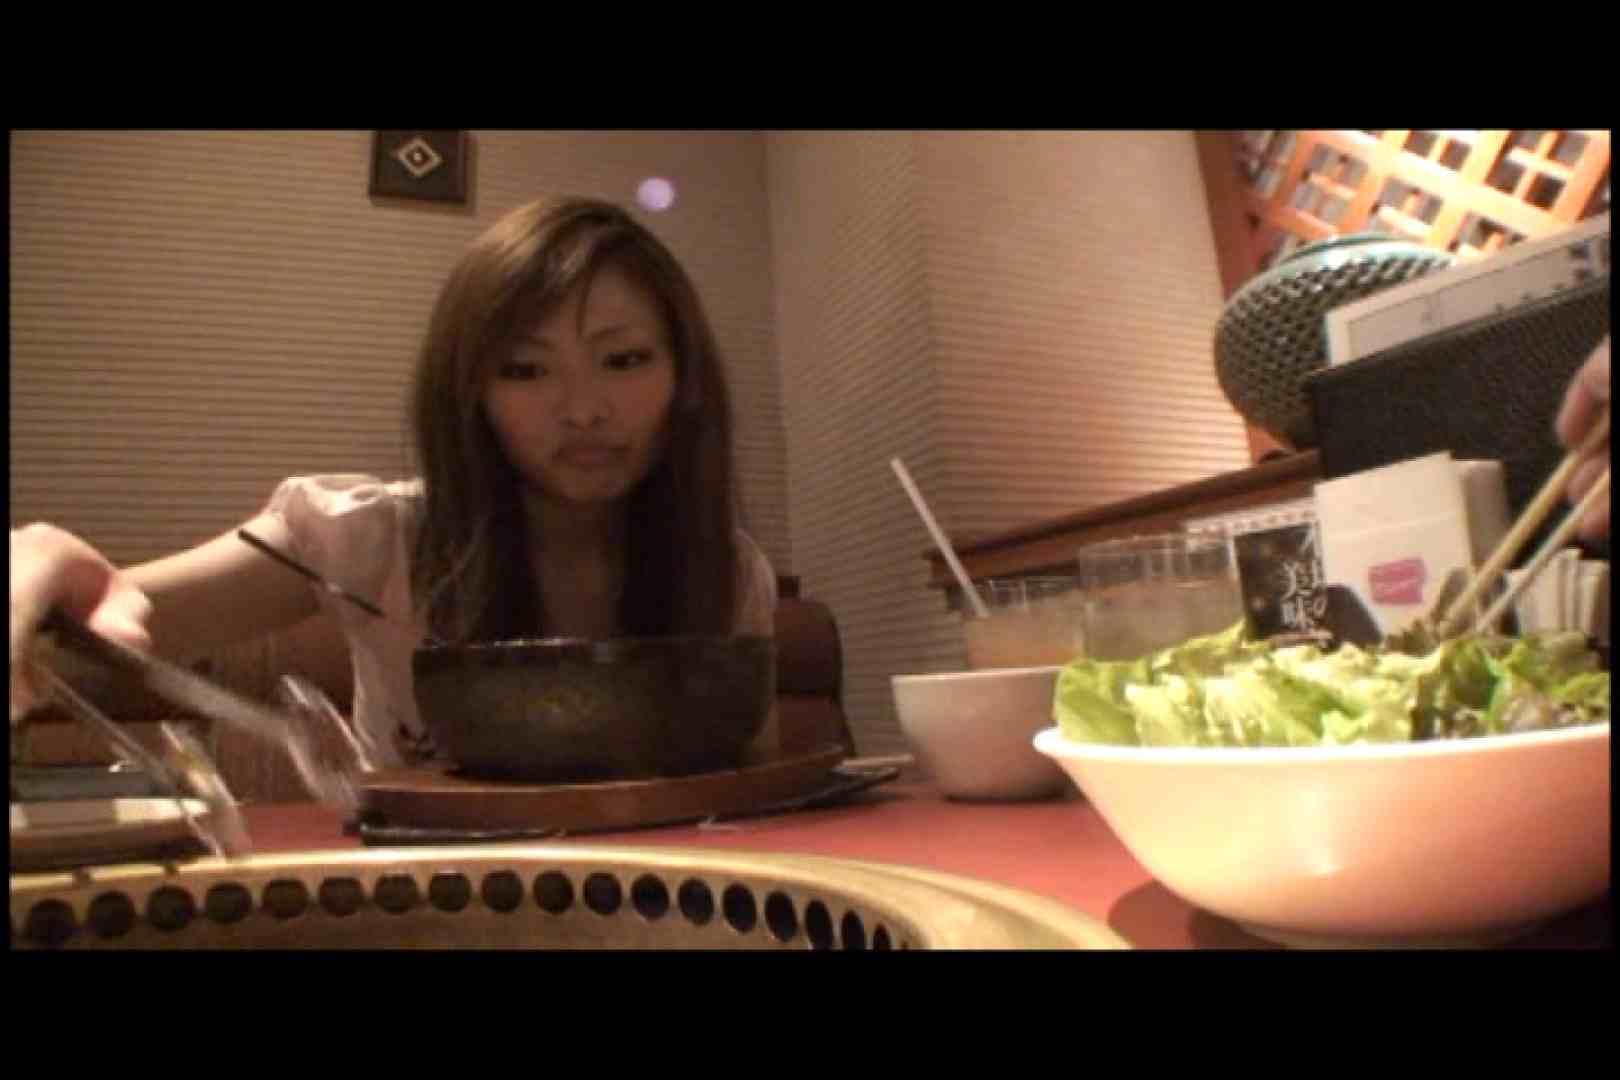 JDハンター全国ツアー vol.052 前編 女子大生のエロ動画 | 0  110PIX 5